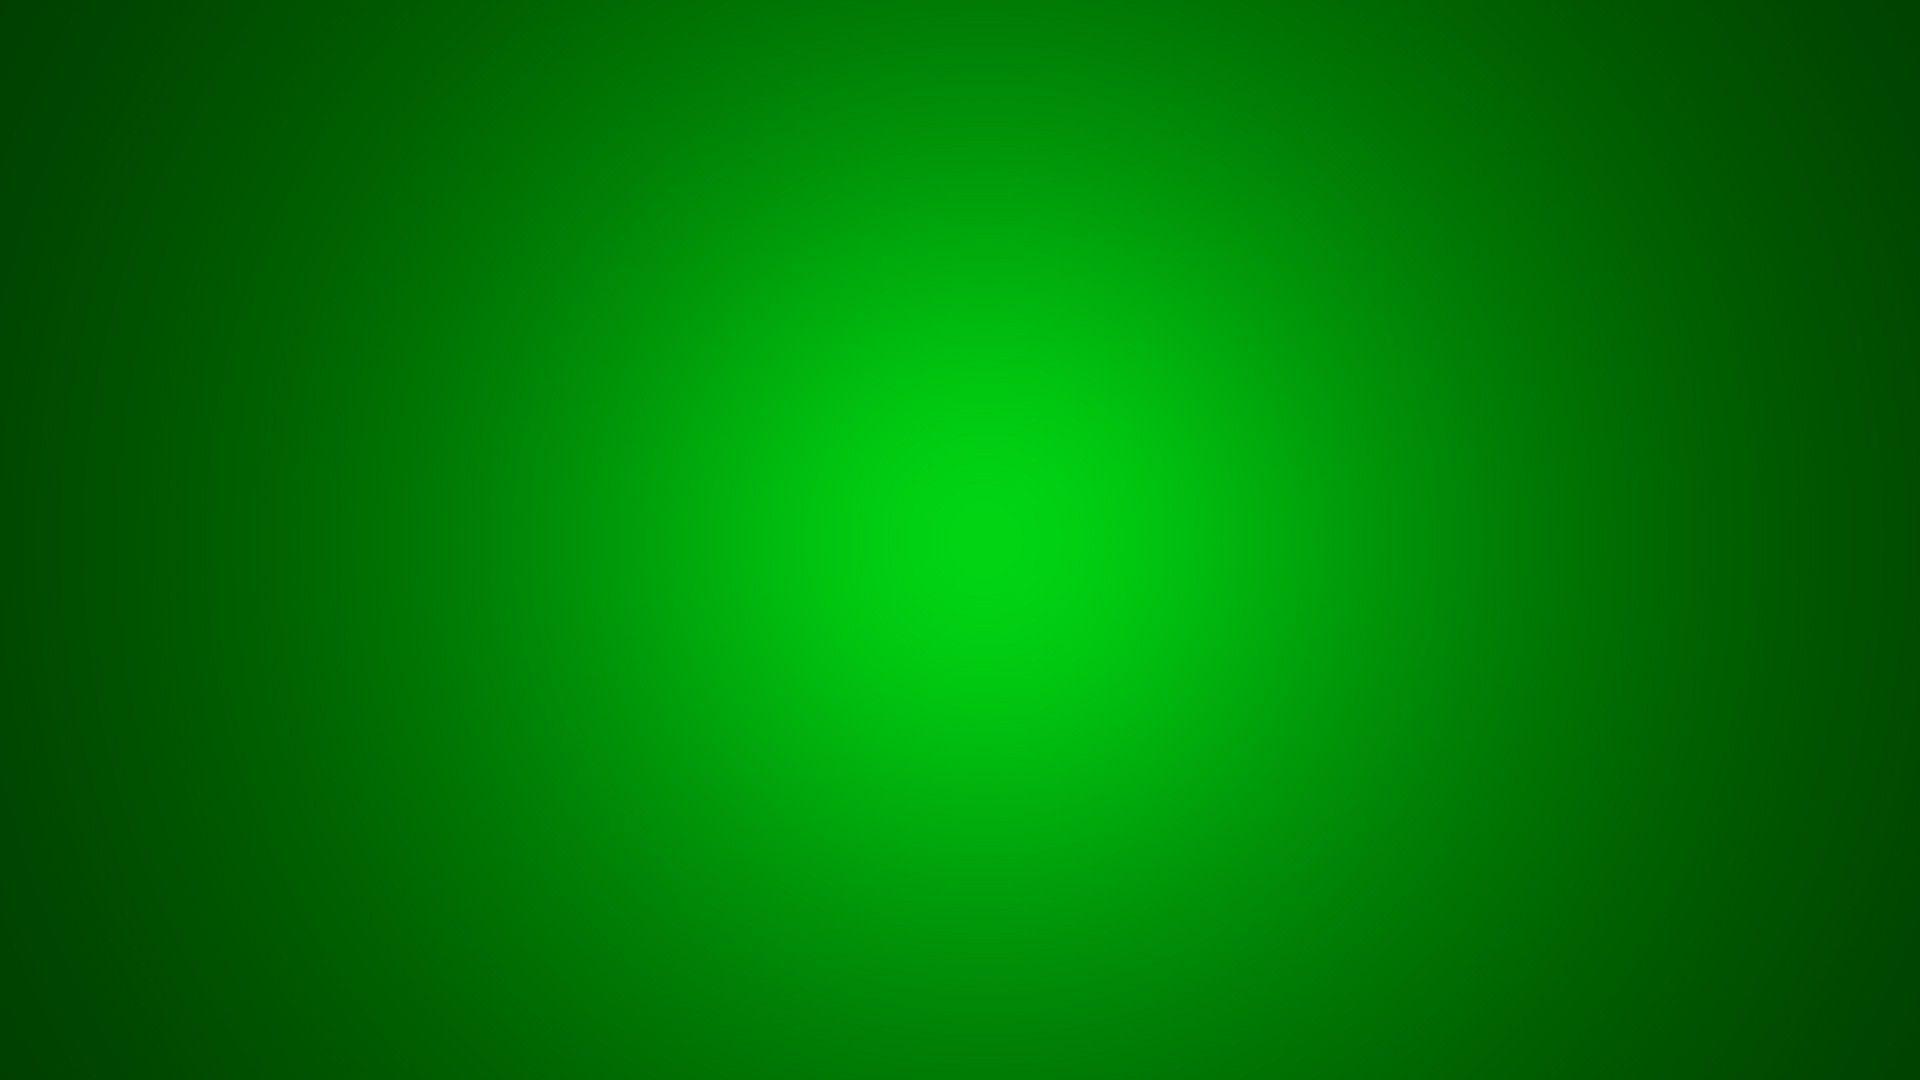 best plain green image colours desktop wallpaper